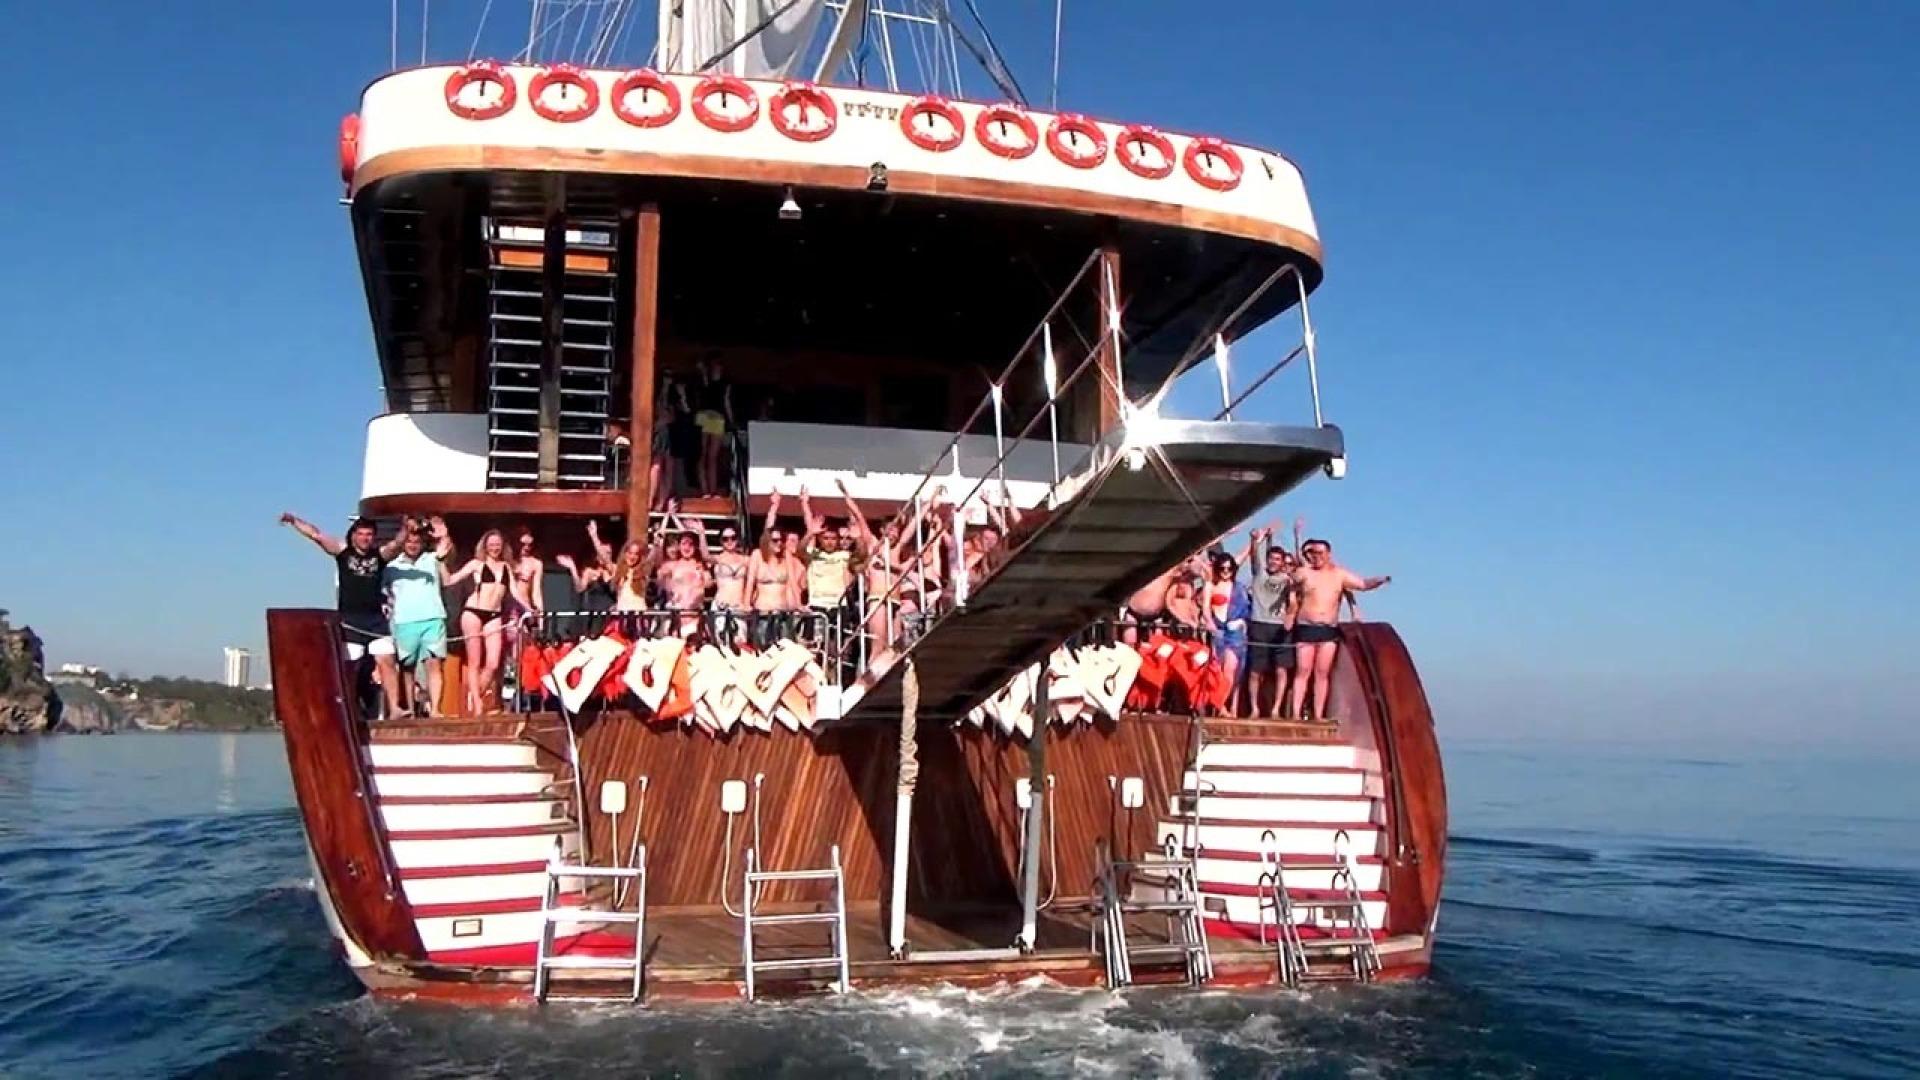 Custom-LZ-140 2009-My Dream Batumi-Georgia-Stern View, Swim Platform, Passerelle-1447693 | Thumbnail